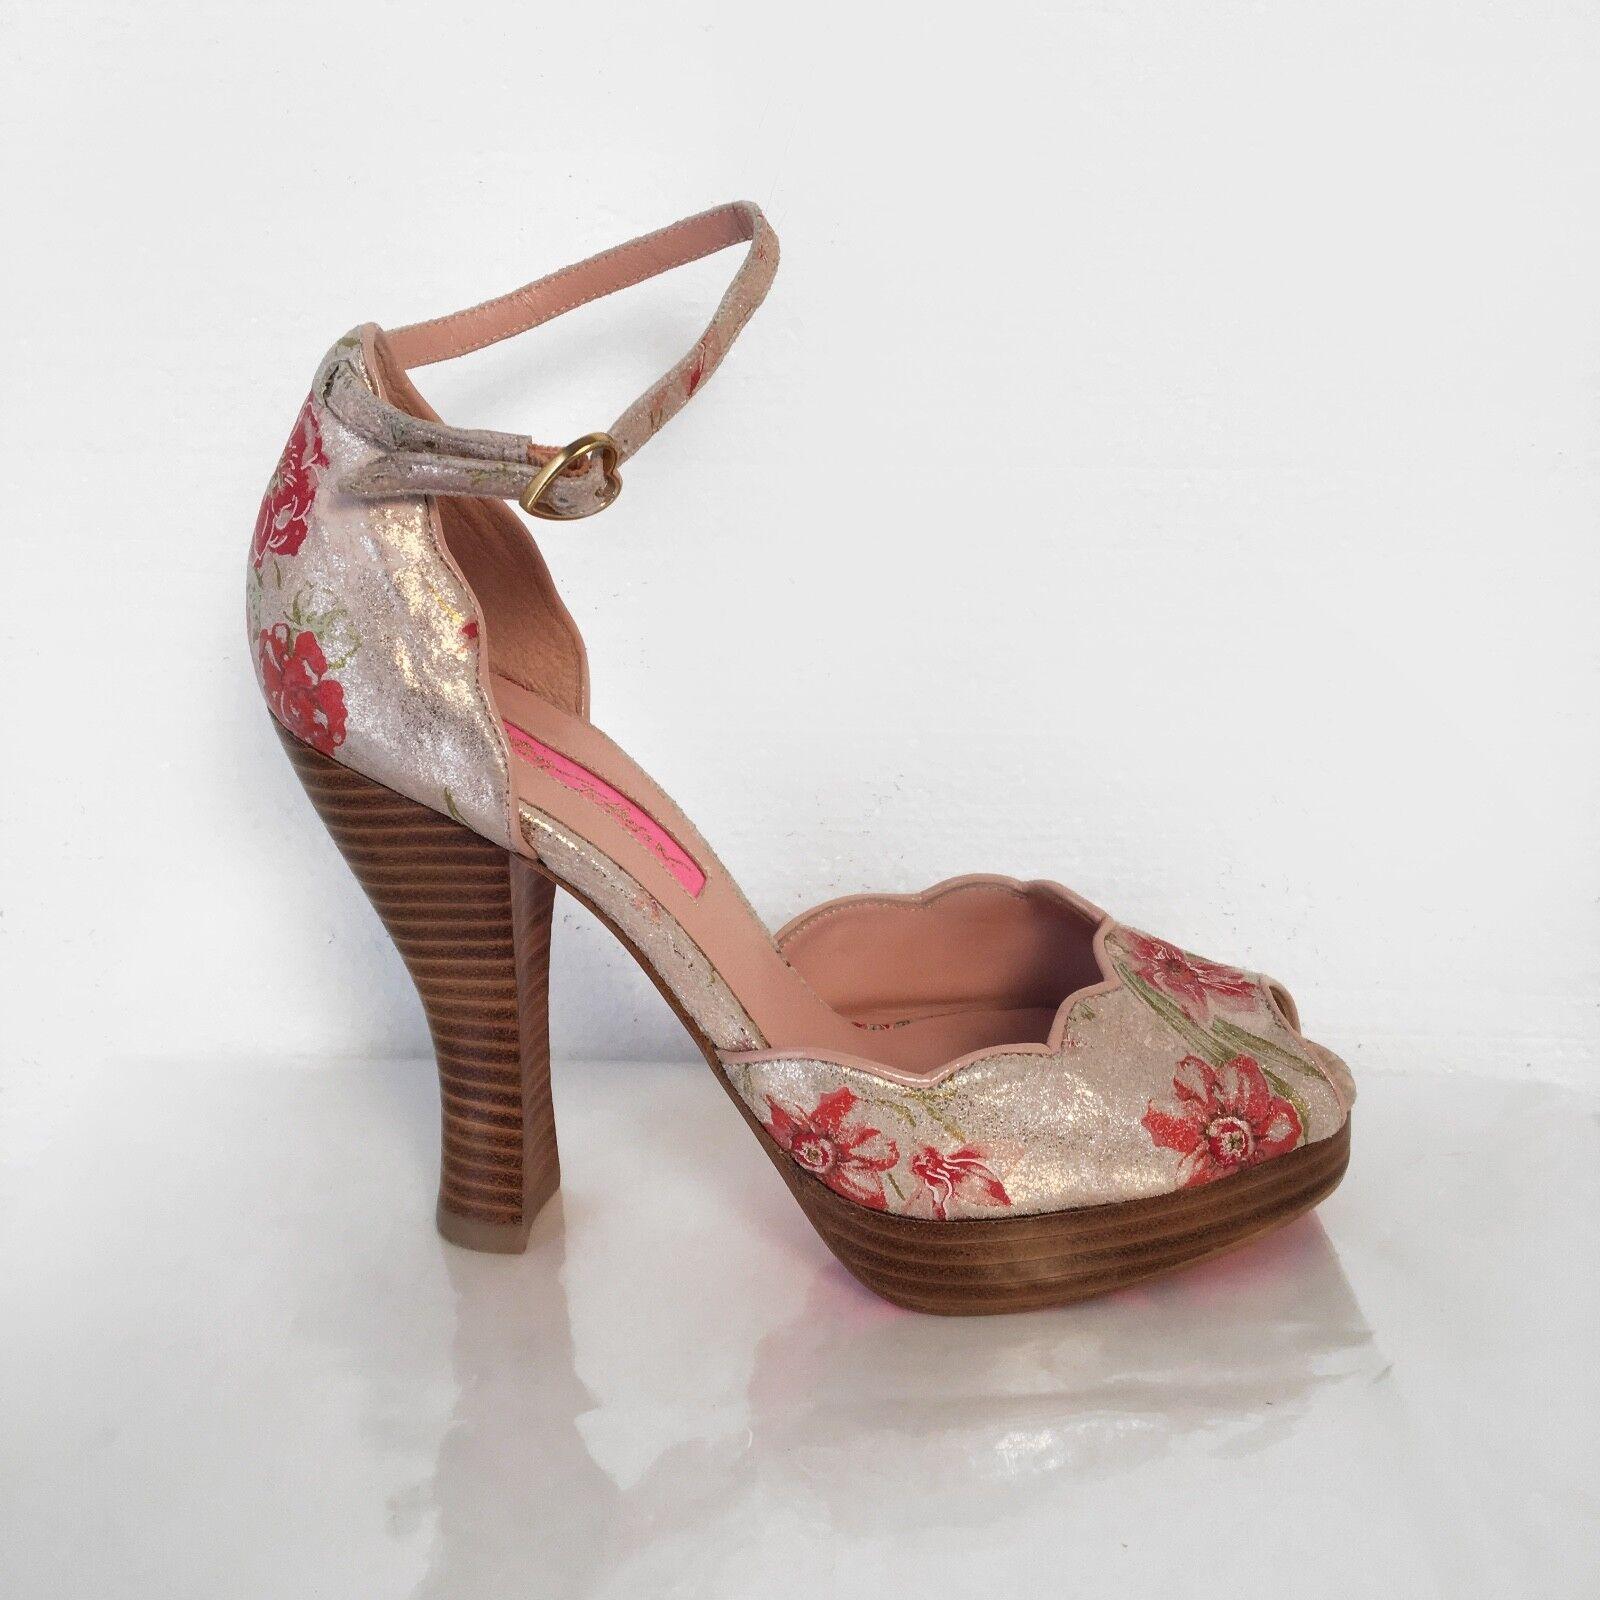 6M Betsey Johnson rosa Shiny Foil Floral Peep Toe Ankle Strap Platform Hi Heels